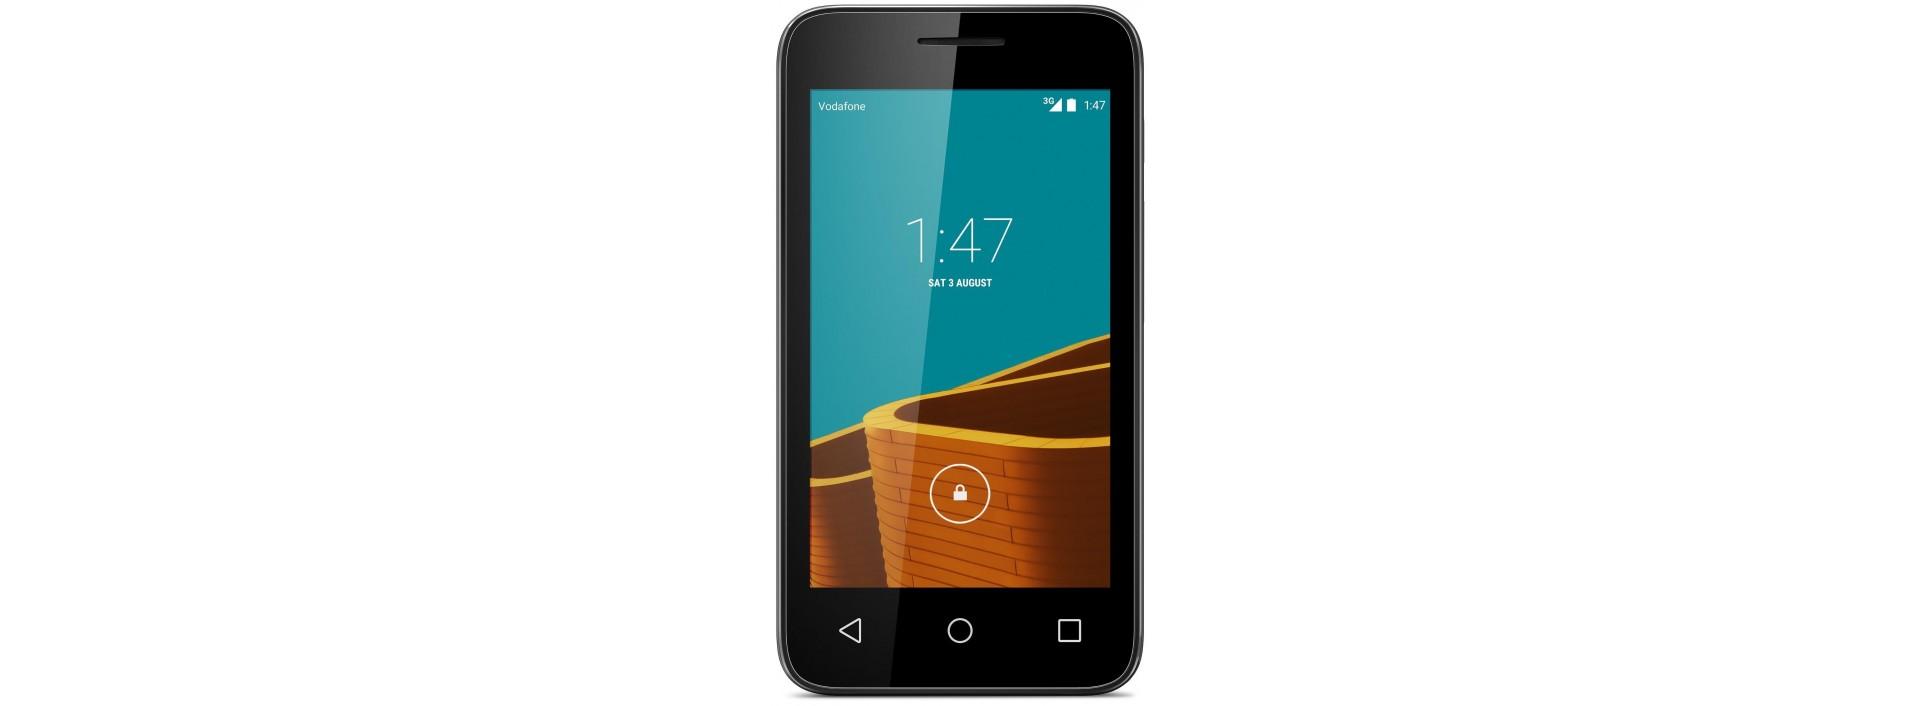 "Fundas PERSONALIZADAS Alcatel One Touch Pixi 3 4.0"", Envío Gratis TMS"